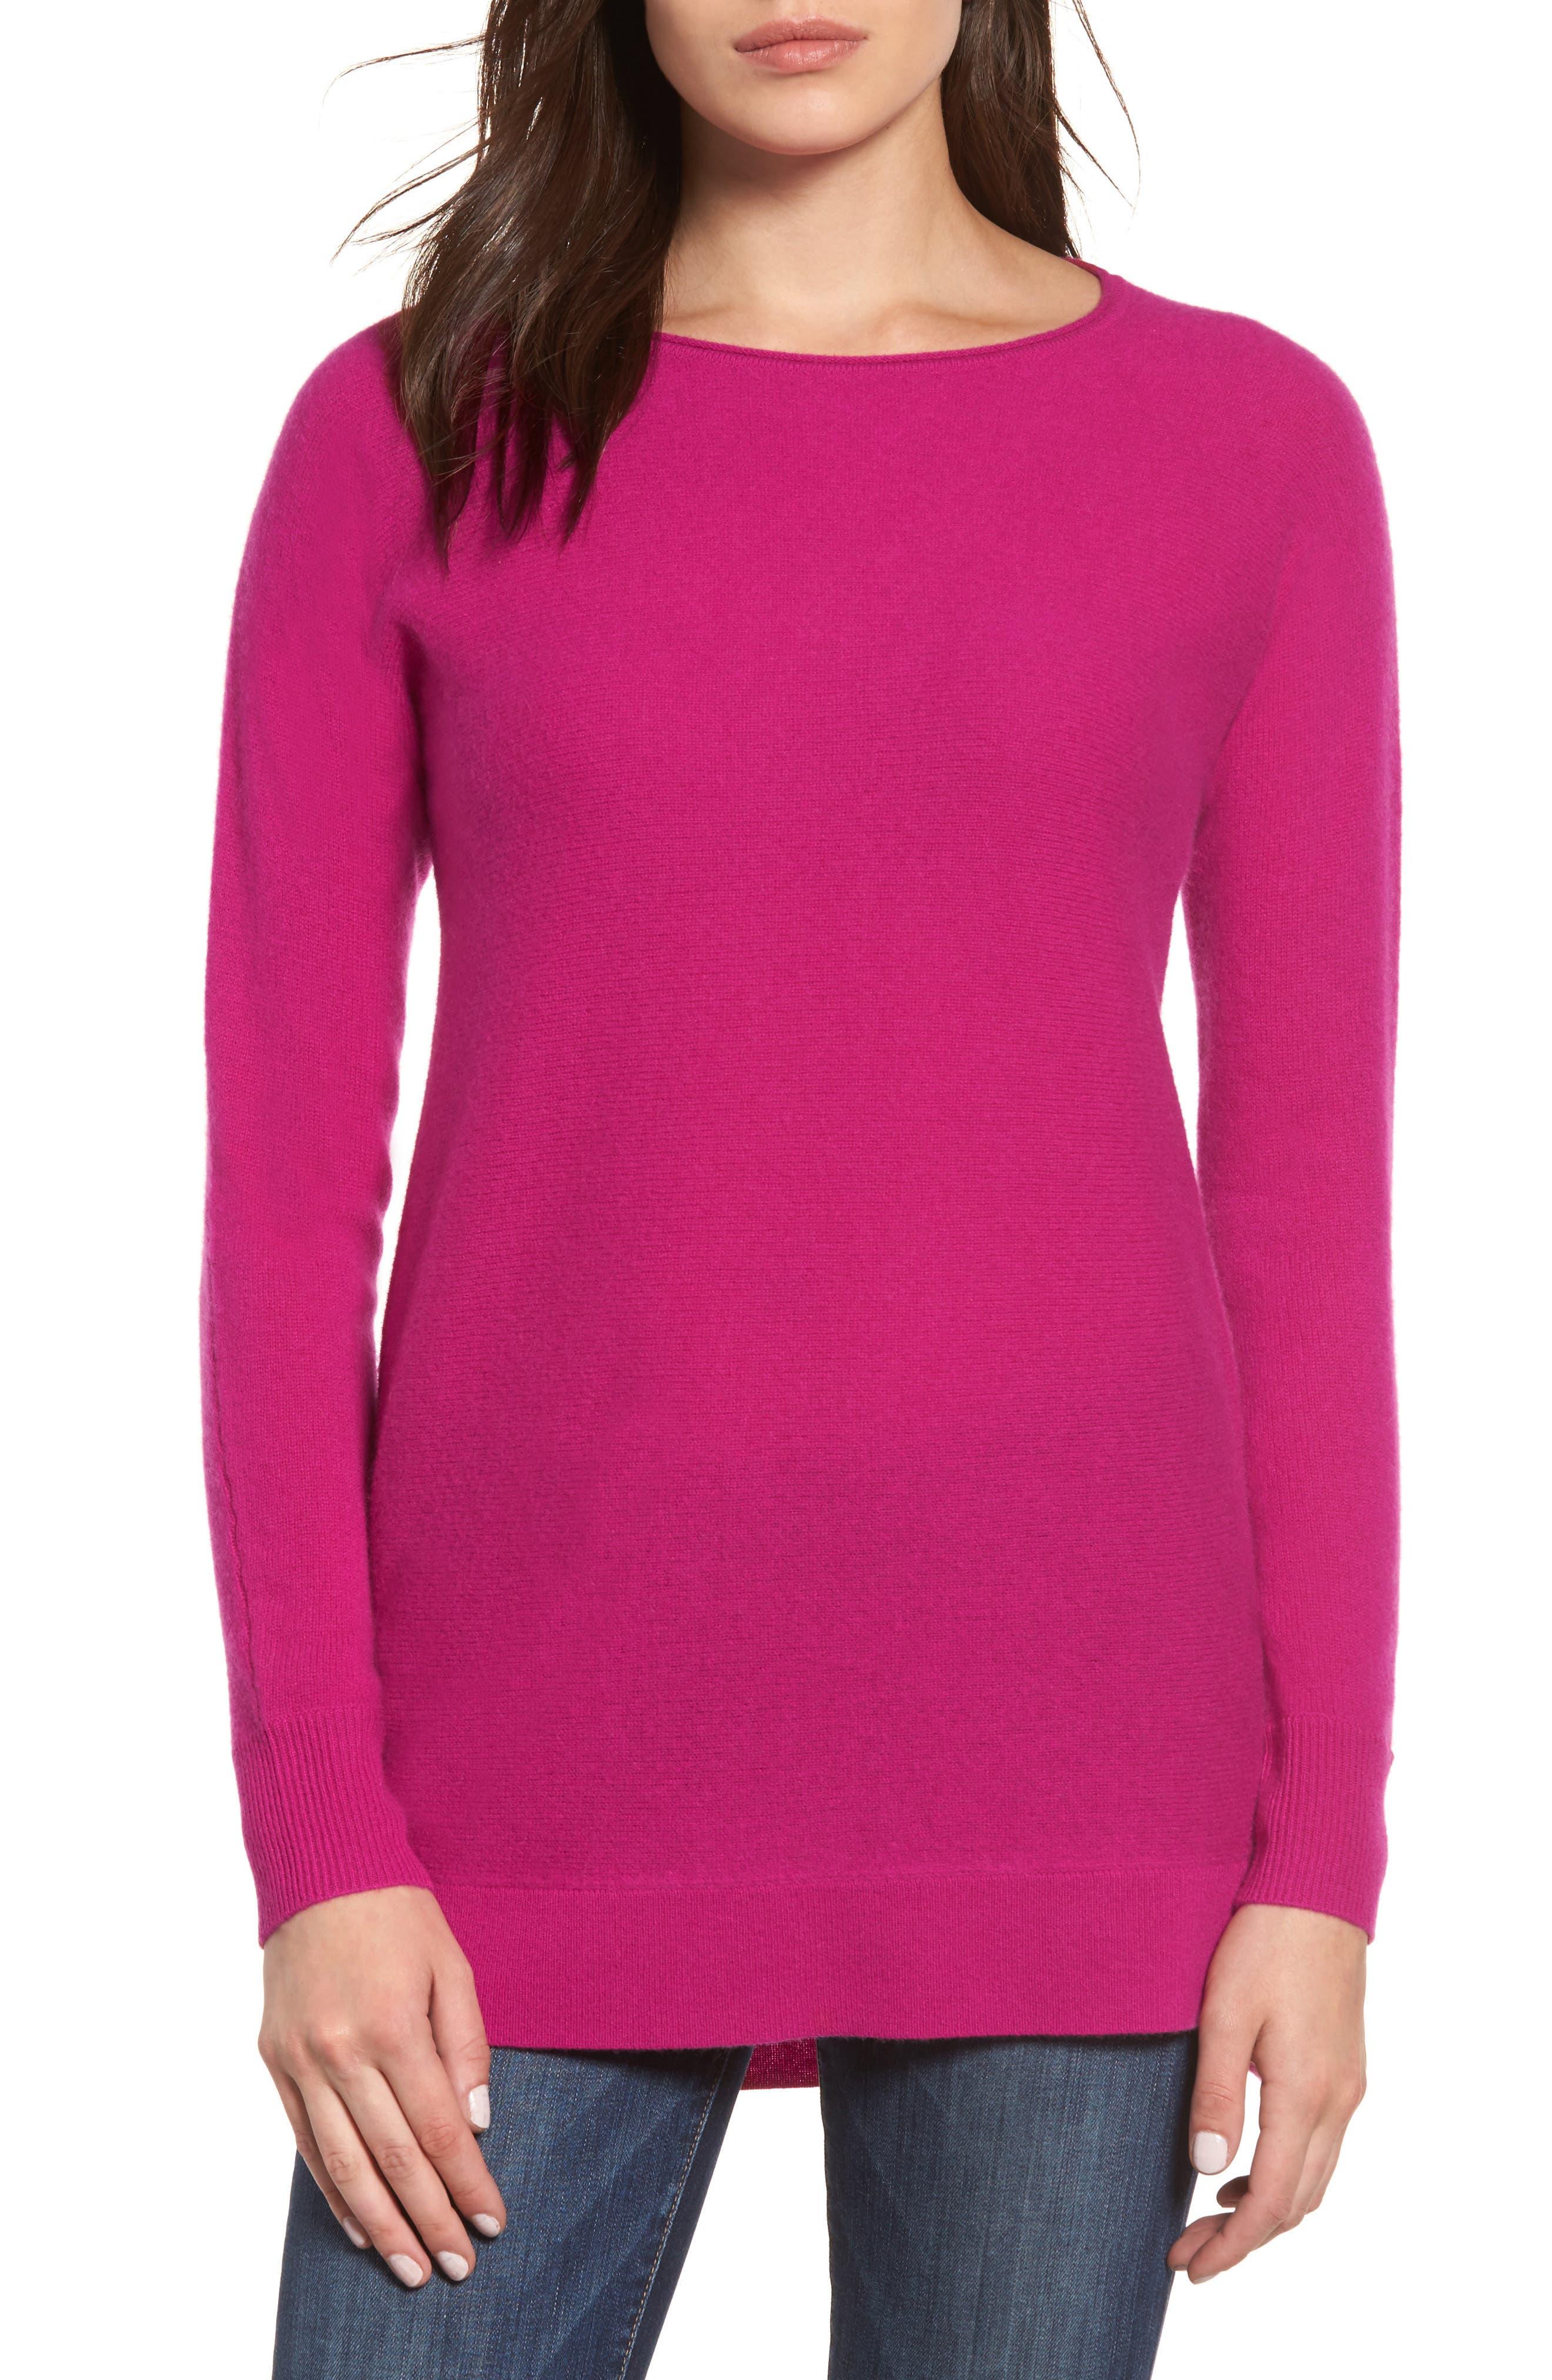 Alternate Image 1 Selected - Halogen® High/Low Wool & Cashmere Tunic Sweater (Regular & Petite)